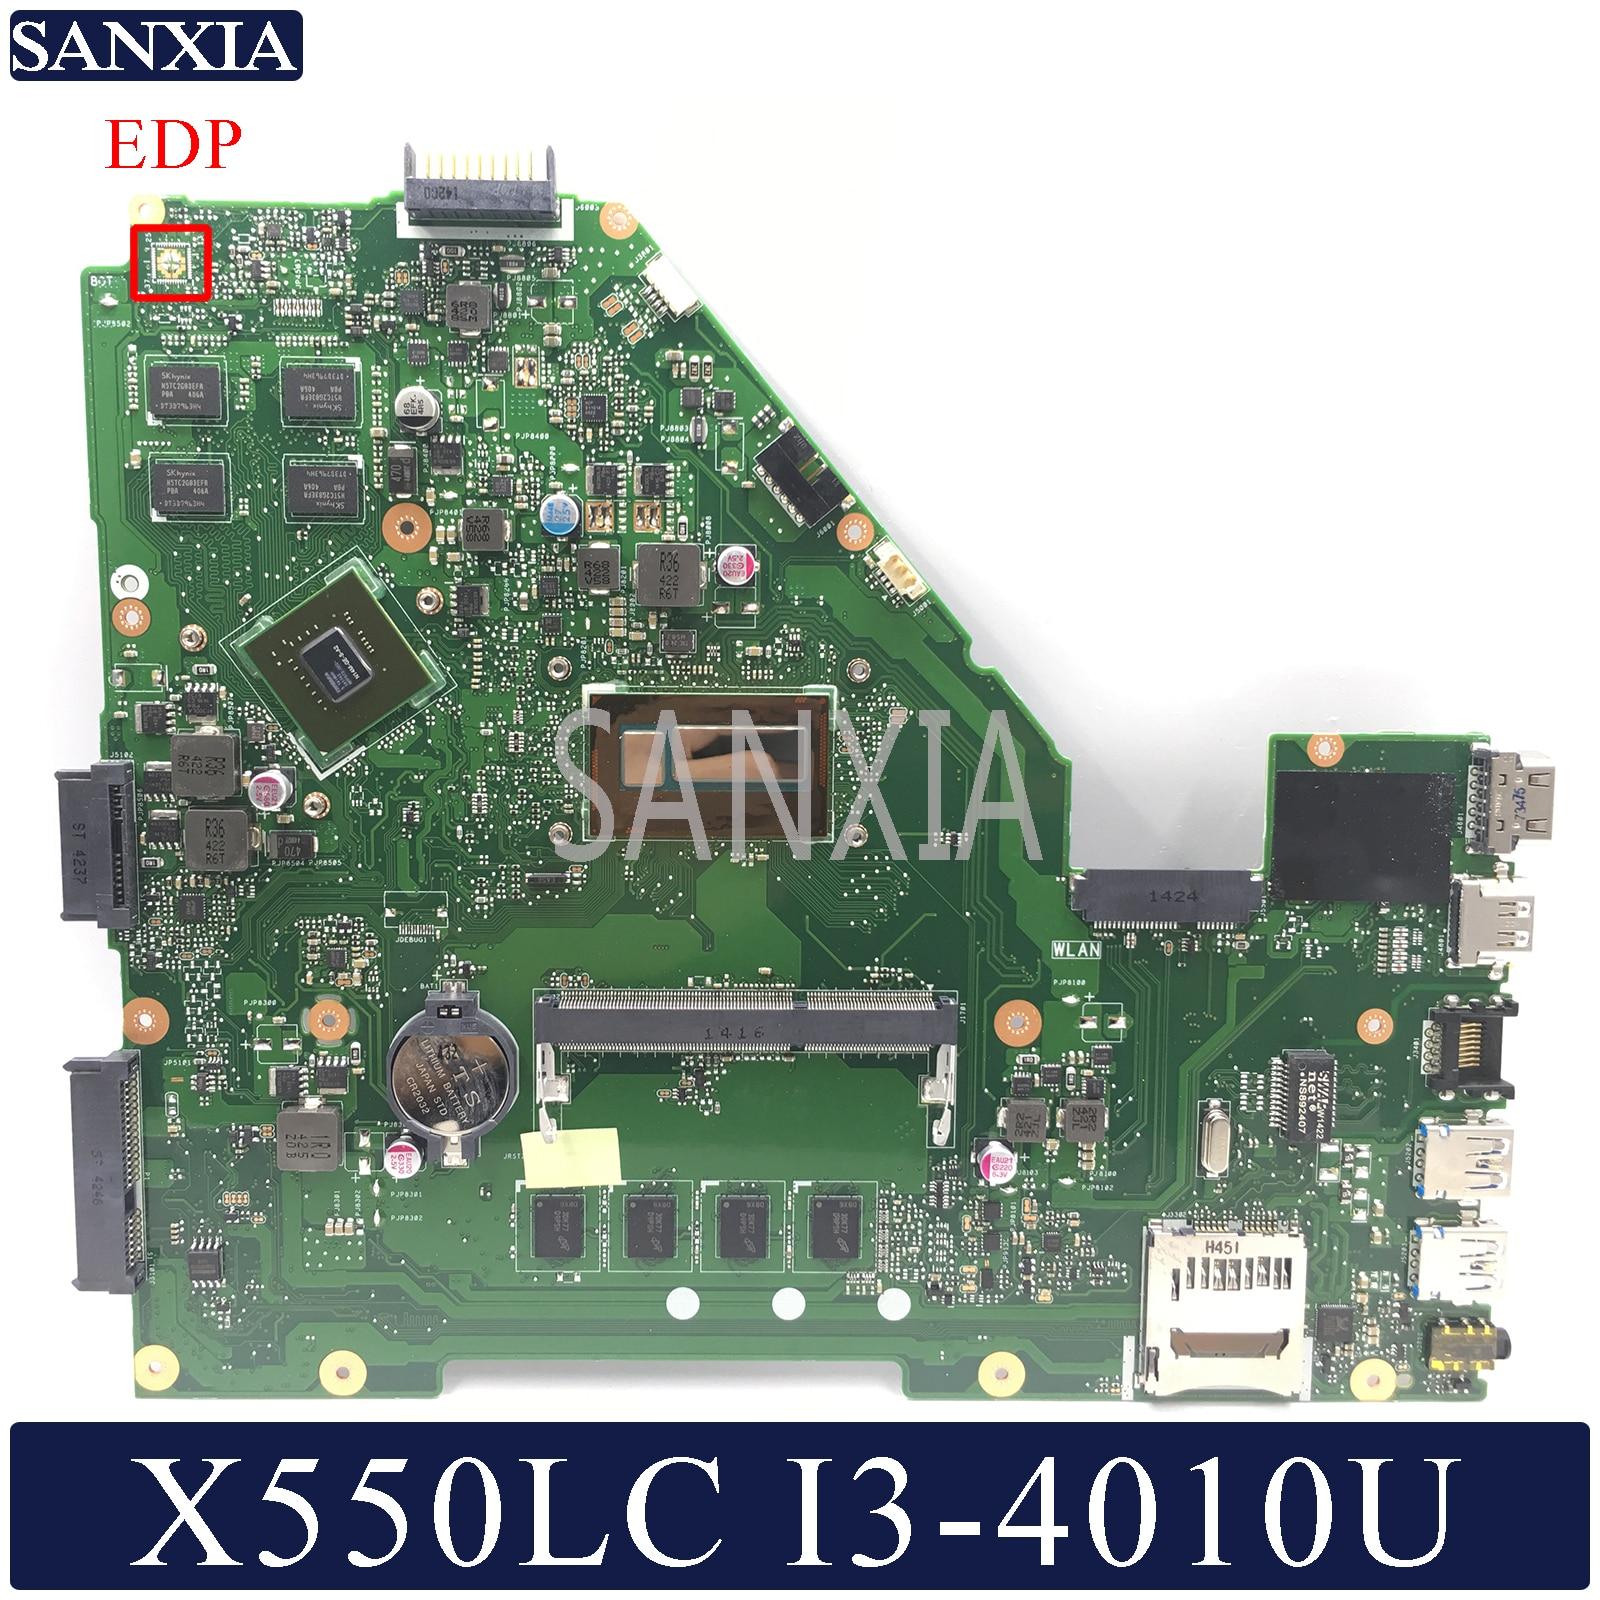 KEFU X550LC Laptop Motherboard For ASUS VivoBook X550LC X550LD X550LN Original Mainboard 4GB-RAM I3-4010U GT720M